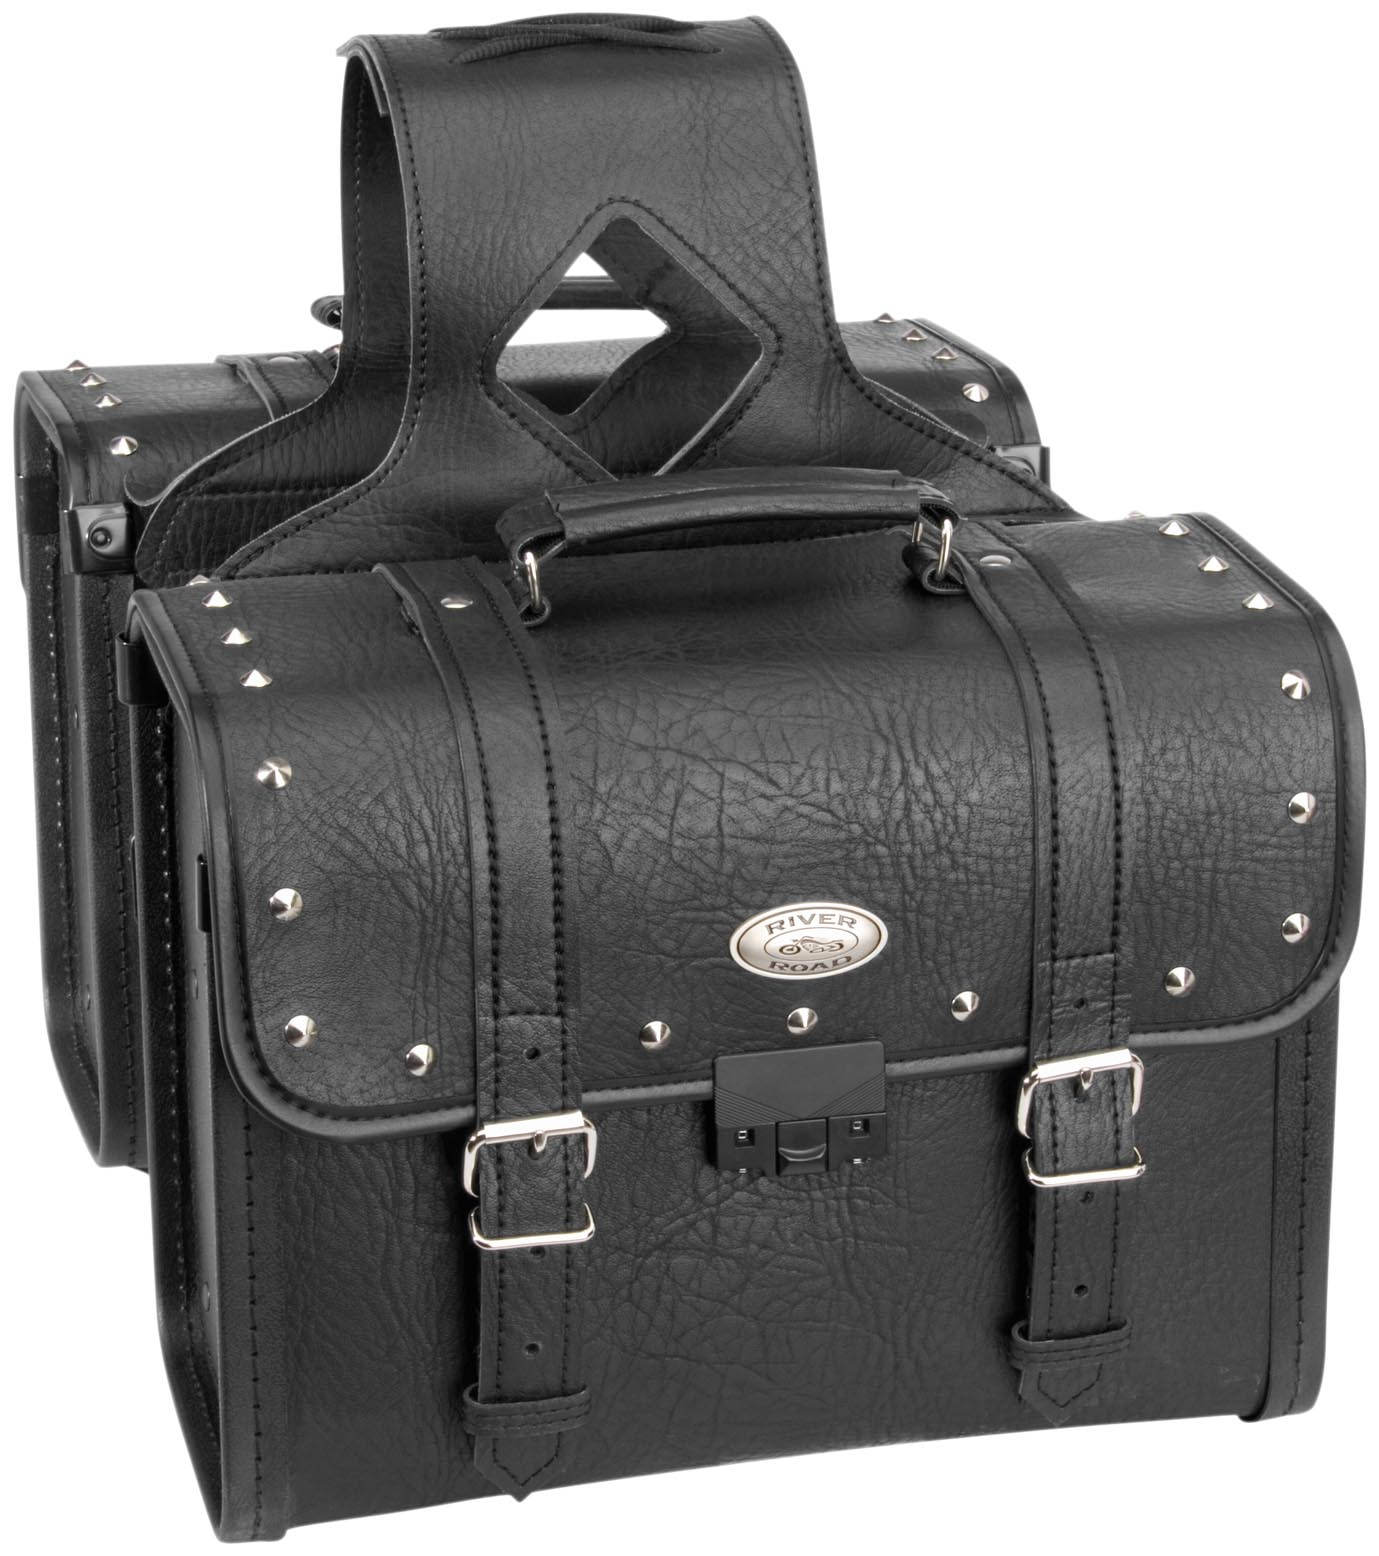 Rigid Zip-Off Saddlebag with Security Lock